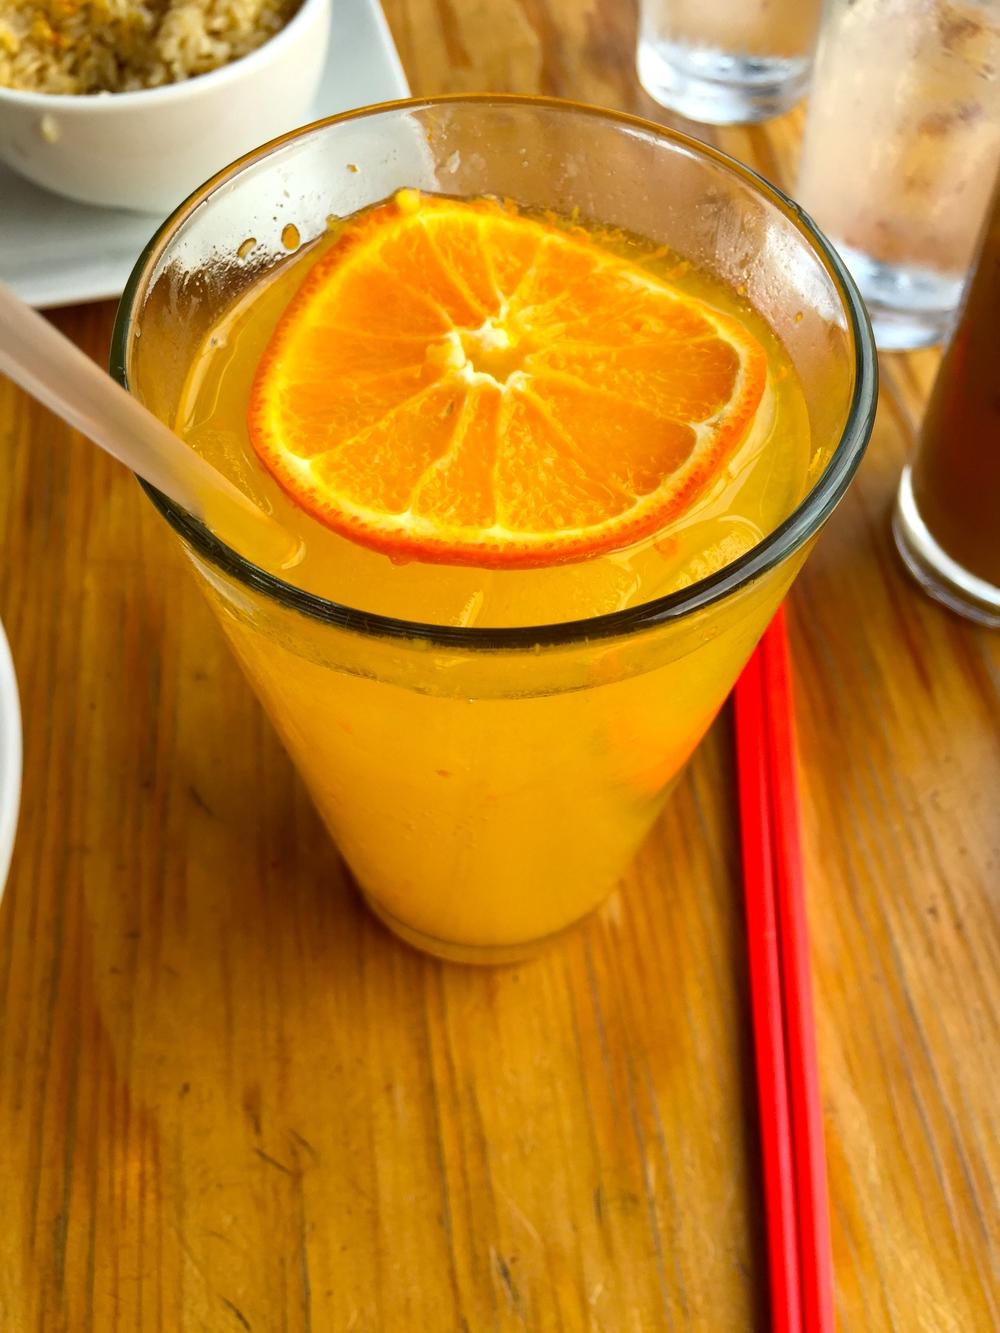 Fresh-squeezed Tangelo homemade soda.